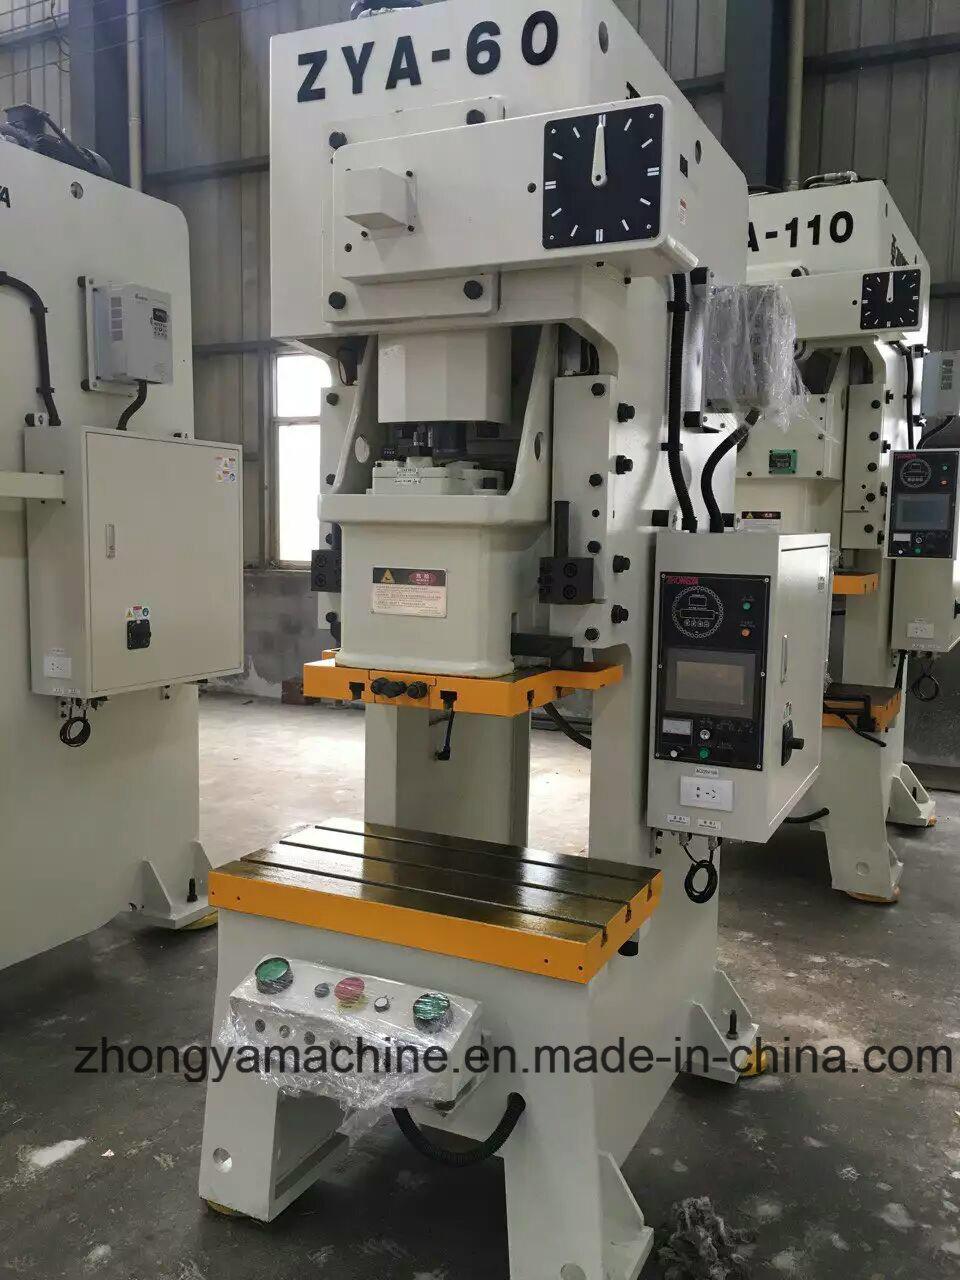 High Precision Pneumatic Power Press Punching Machine Zya-60ton